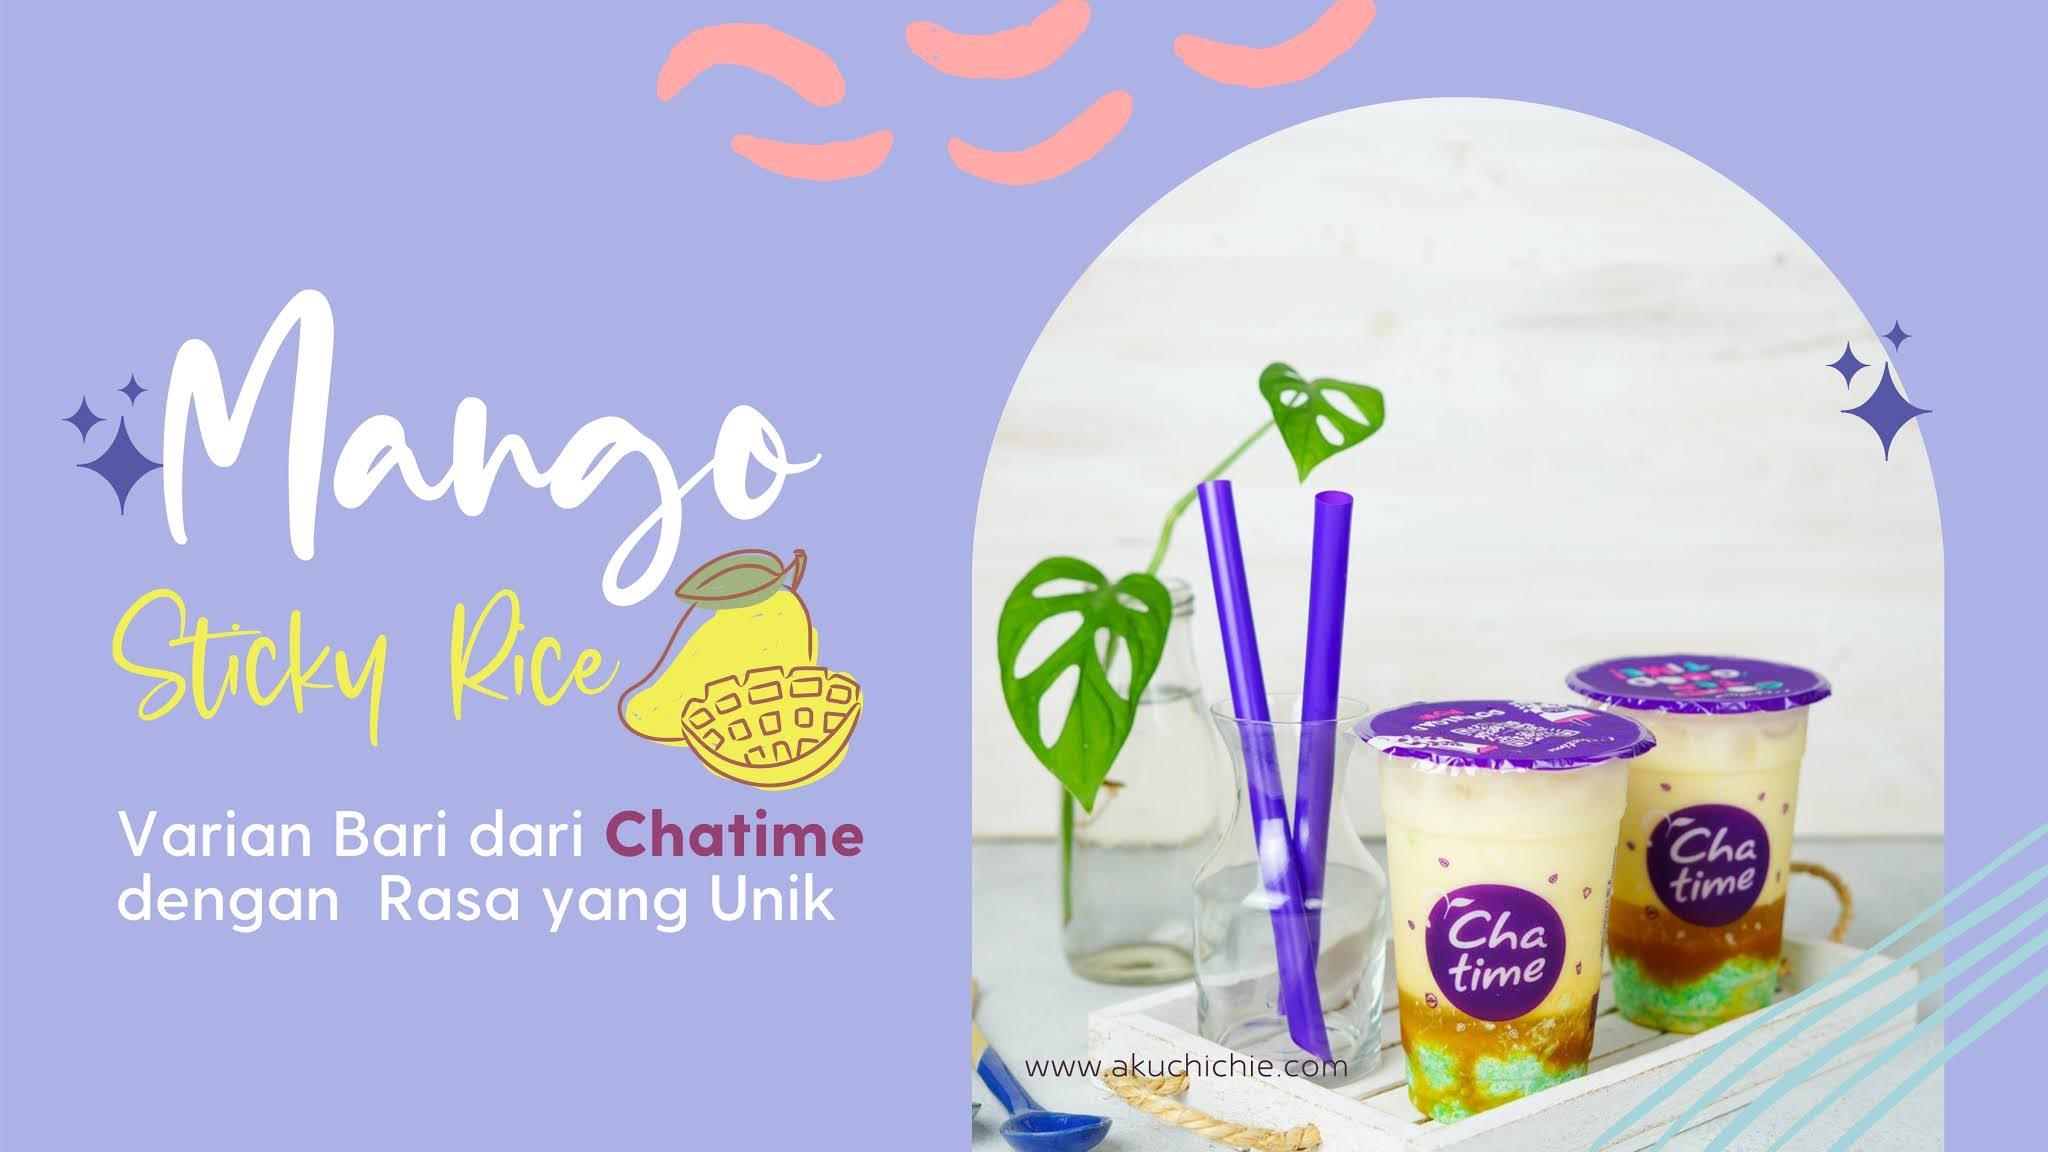 Mango Sticky Rice Chatime